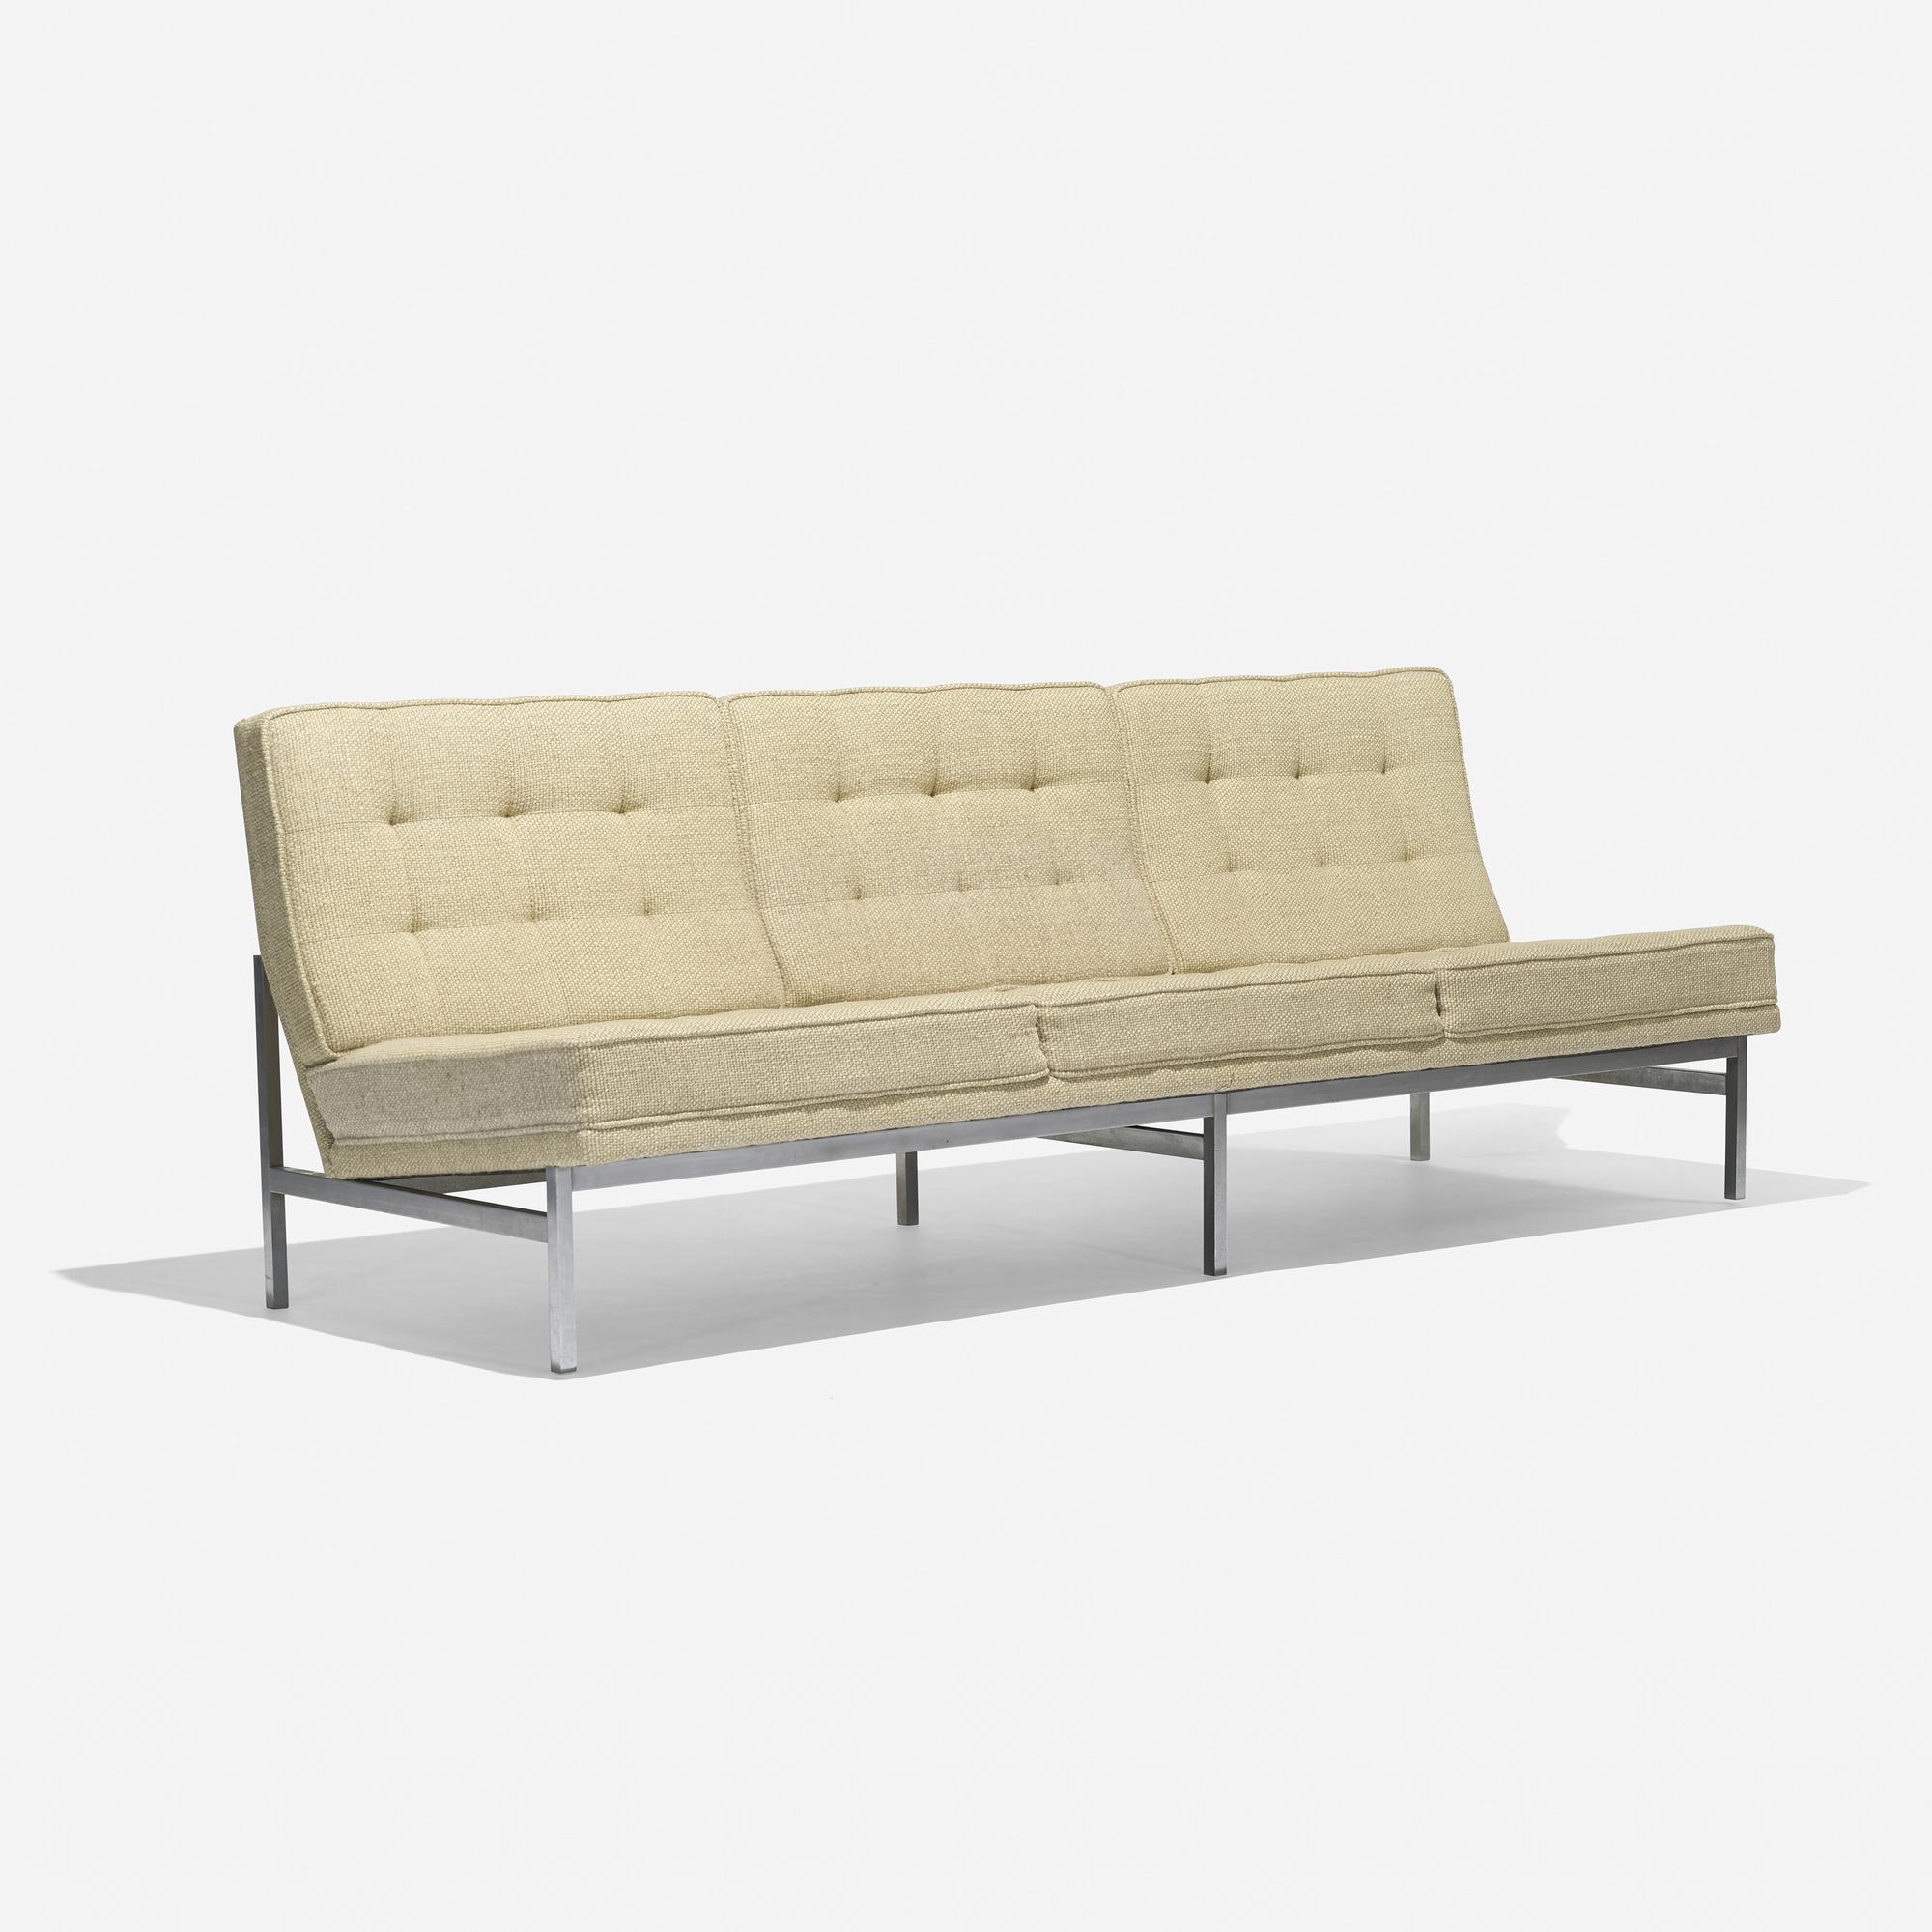 341 Florence Knoll Sofa Model 2551 1 Of 3